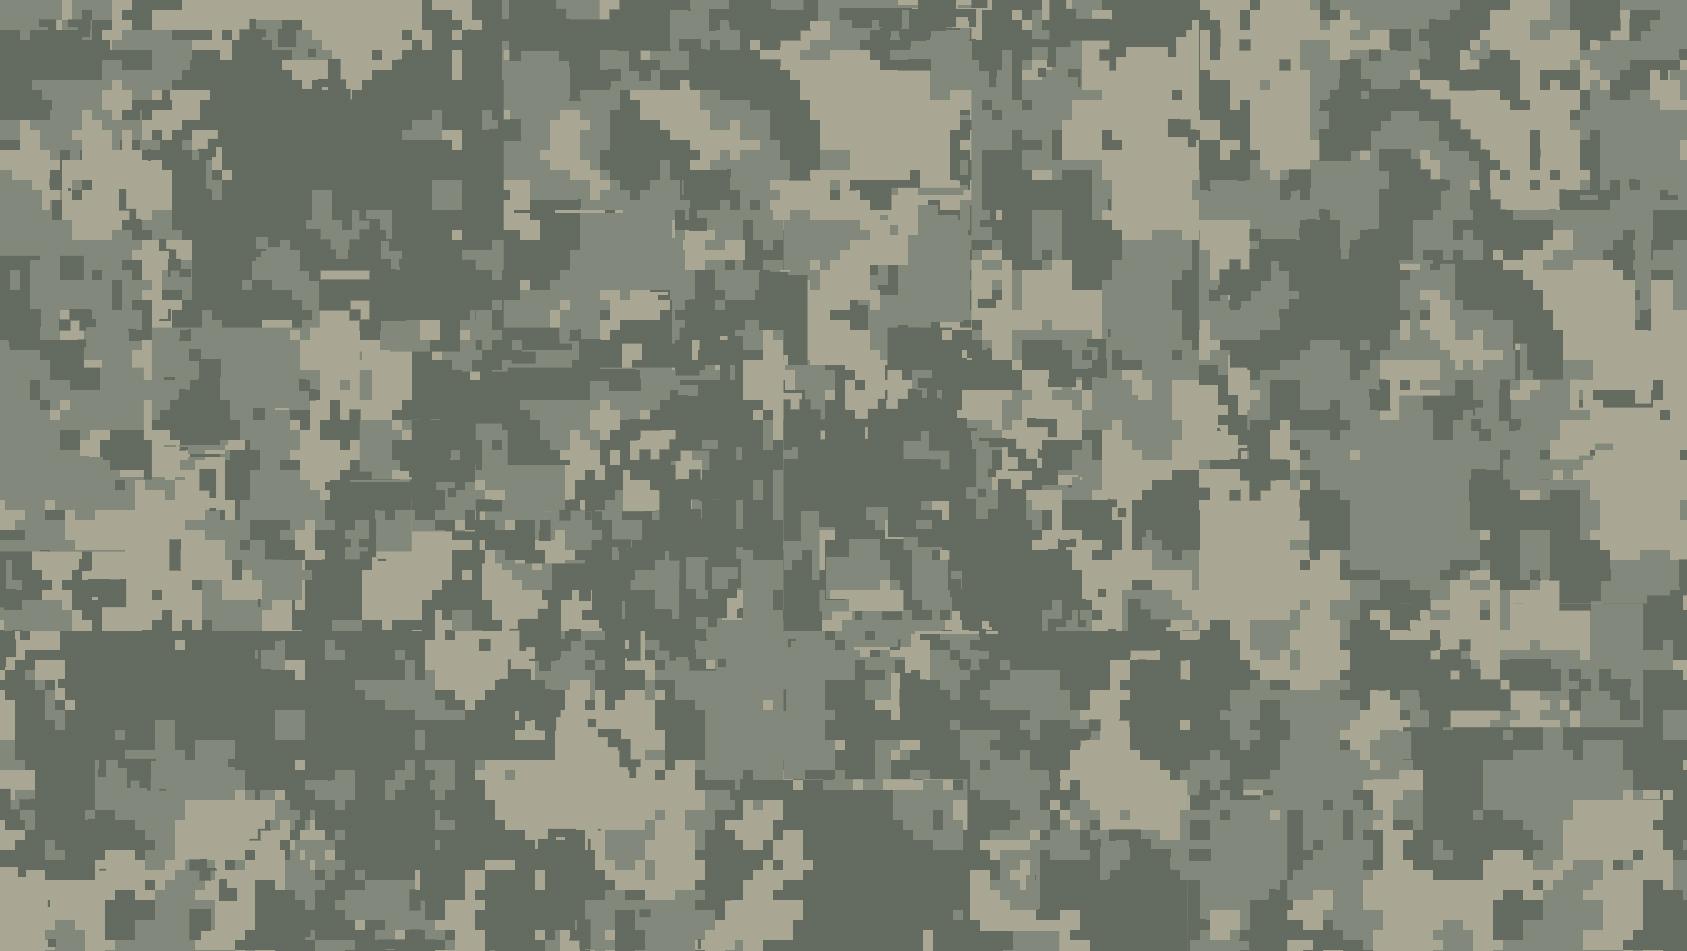 Pixel Black Digital Camouflage Wallpaper